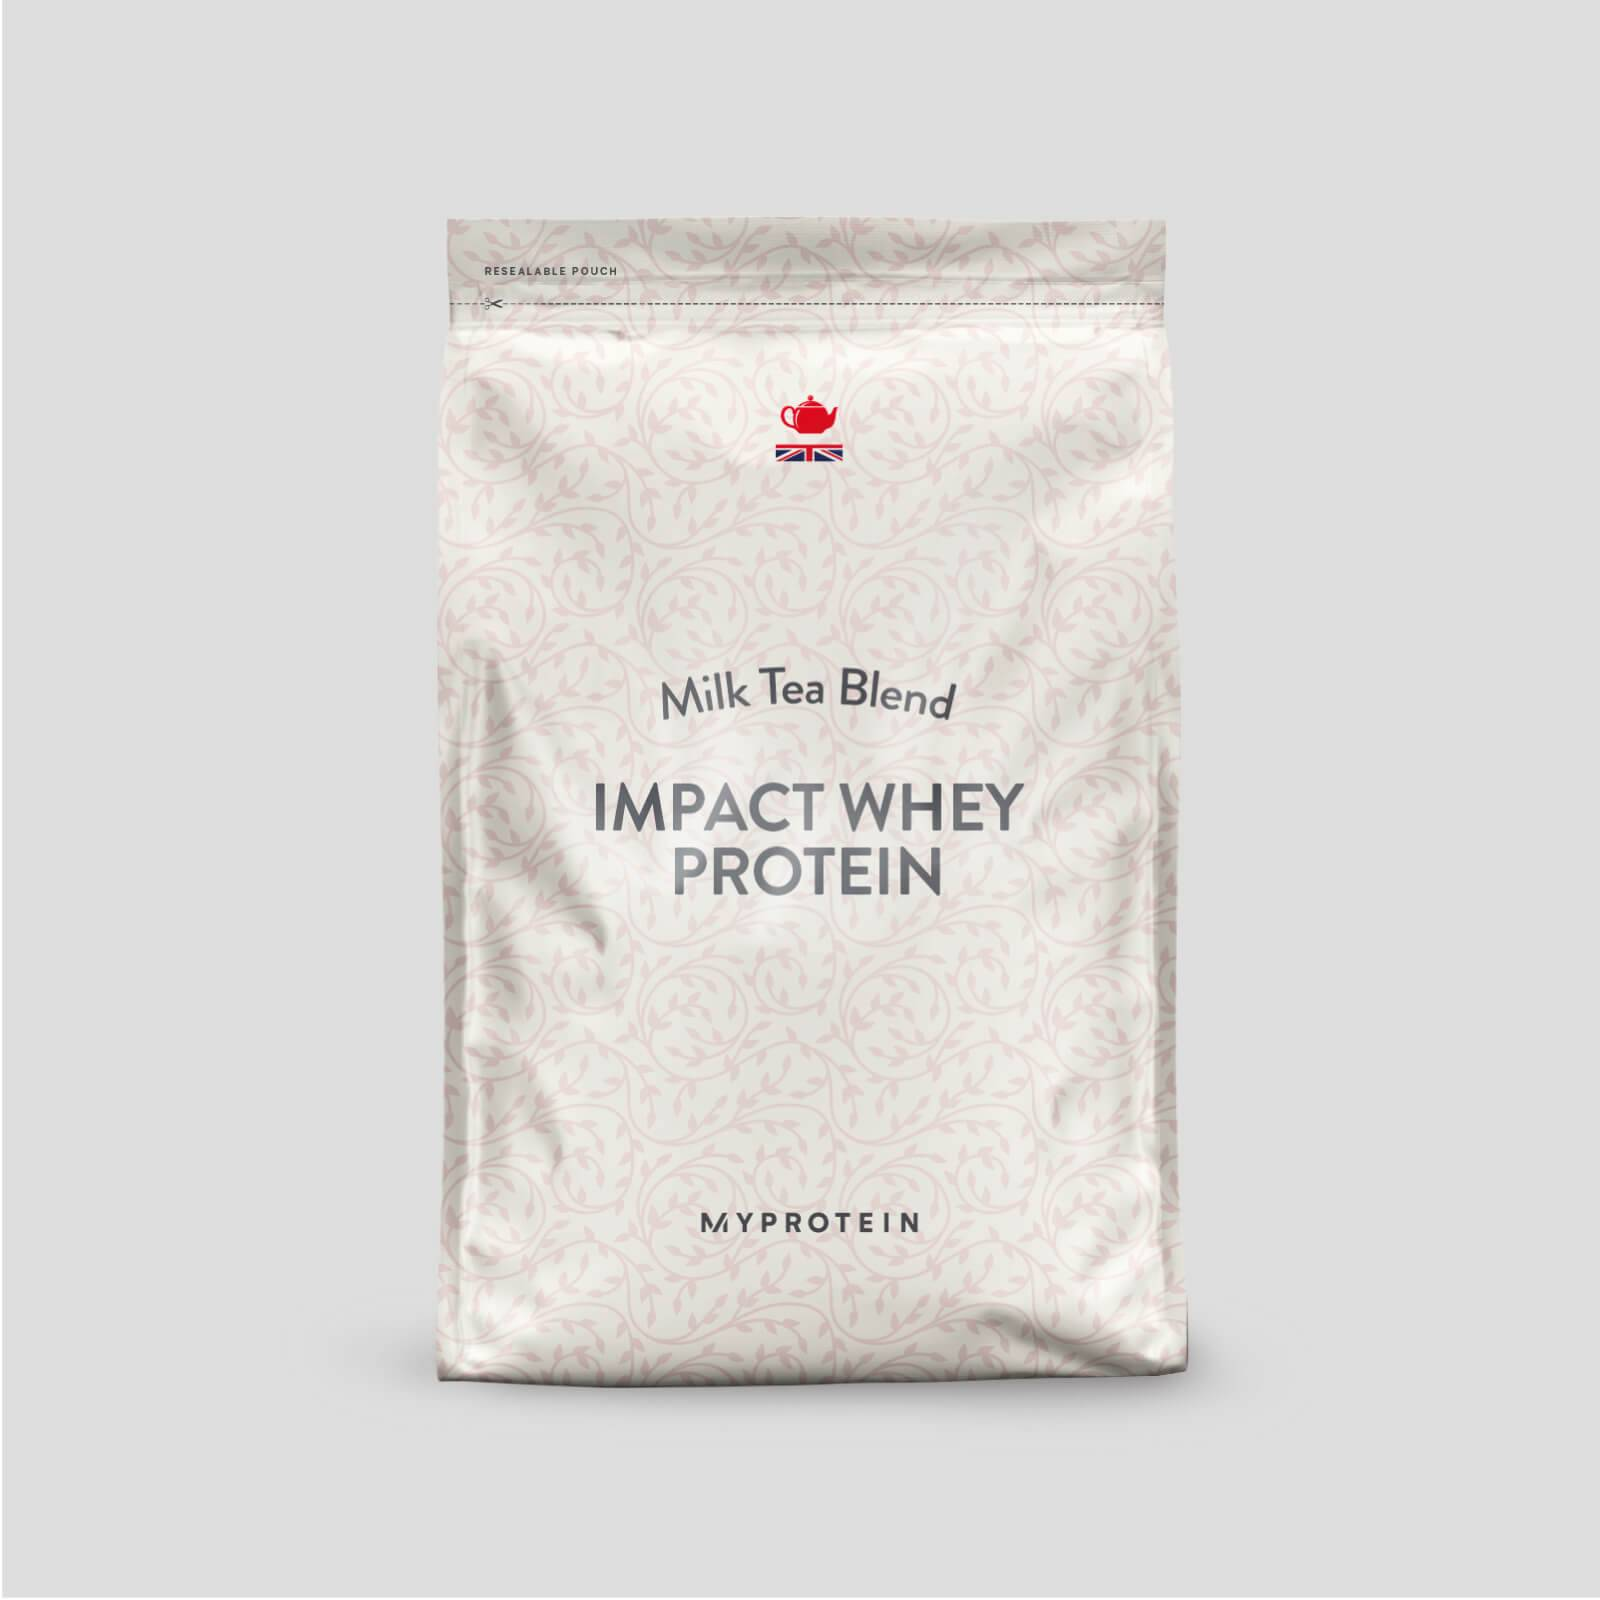 Myprotein Impact Whey Protein - Thé au Lait - 2.5kg - Milk Tea